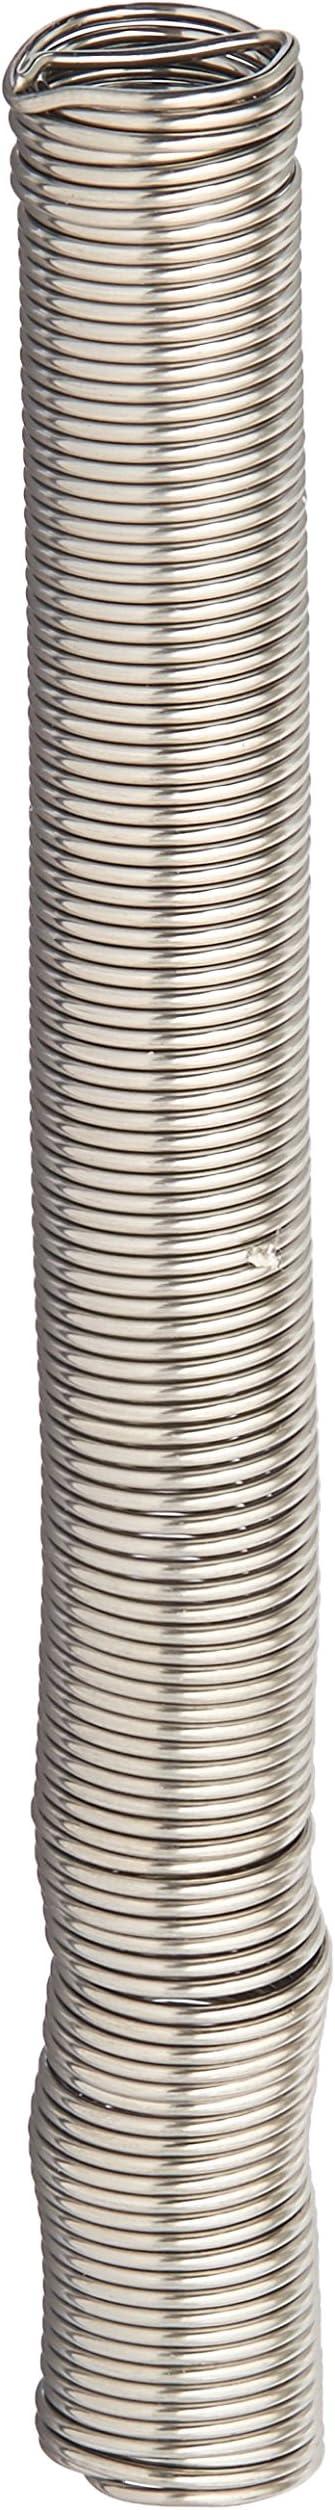 "0.031/"" Wire Diameter Kester 83-4000-0000 SN60PB40 Solder Pocket Pack"